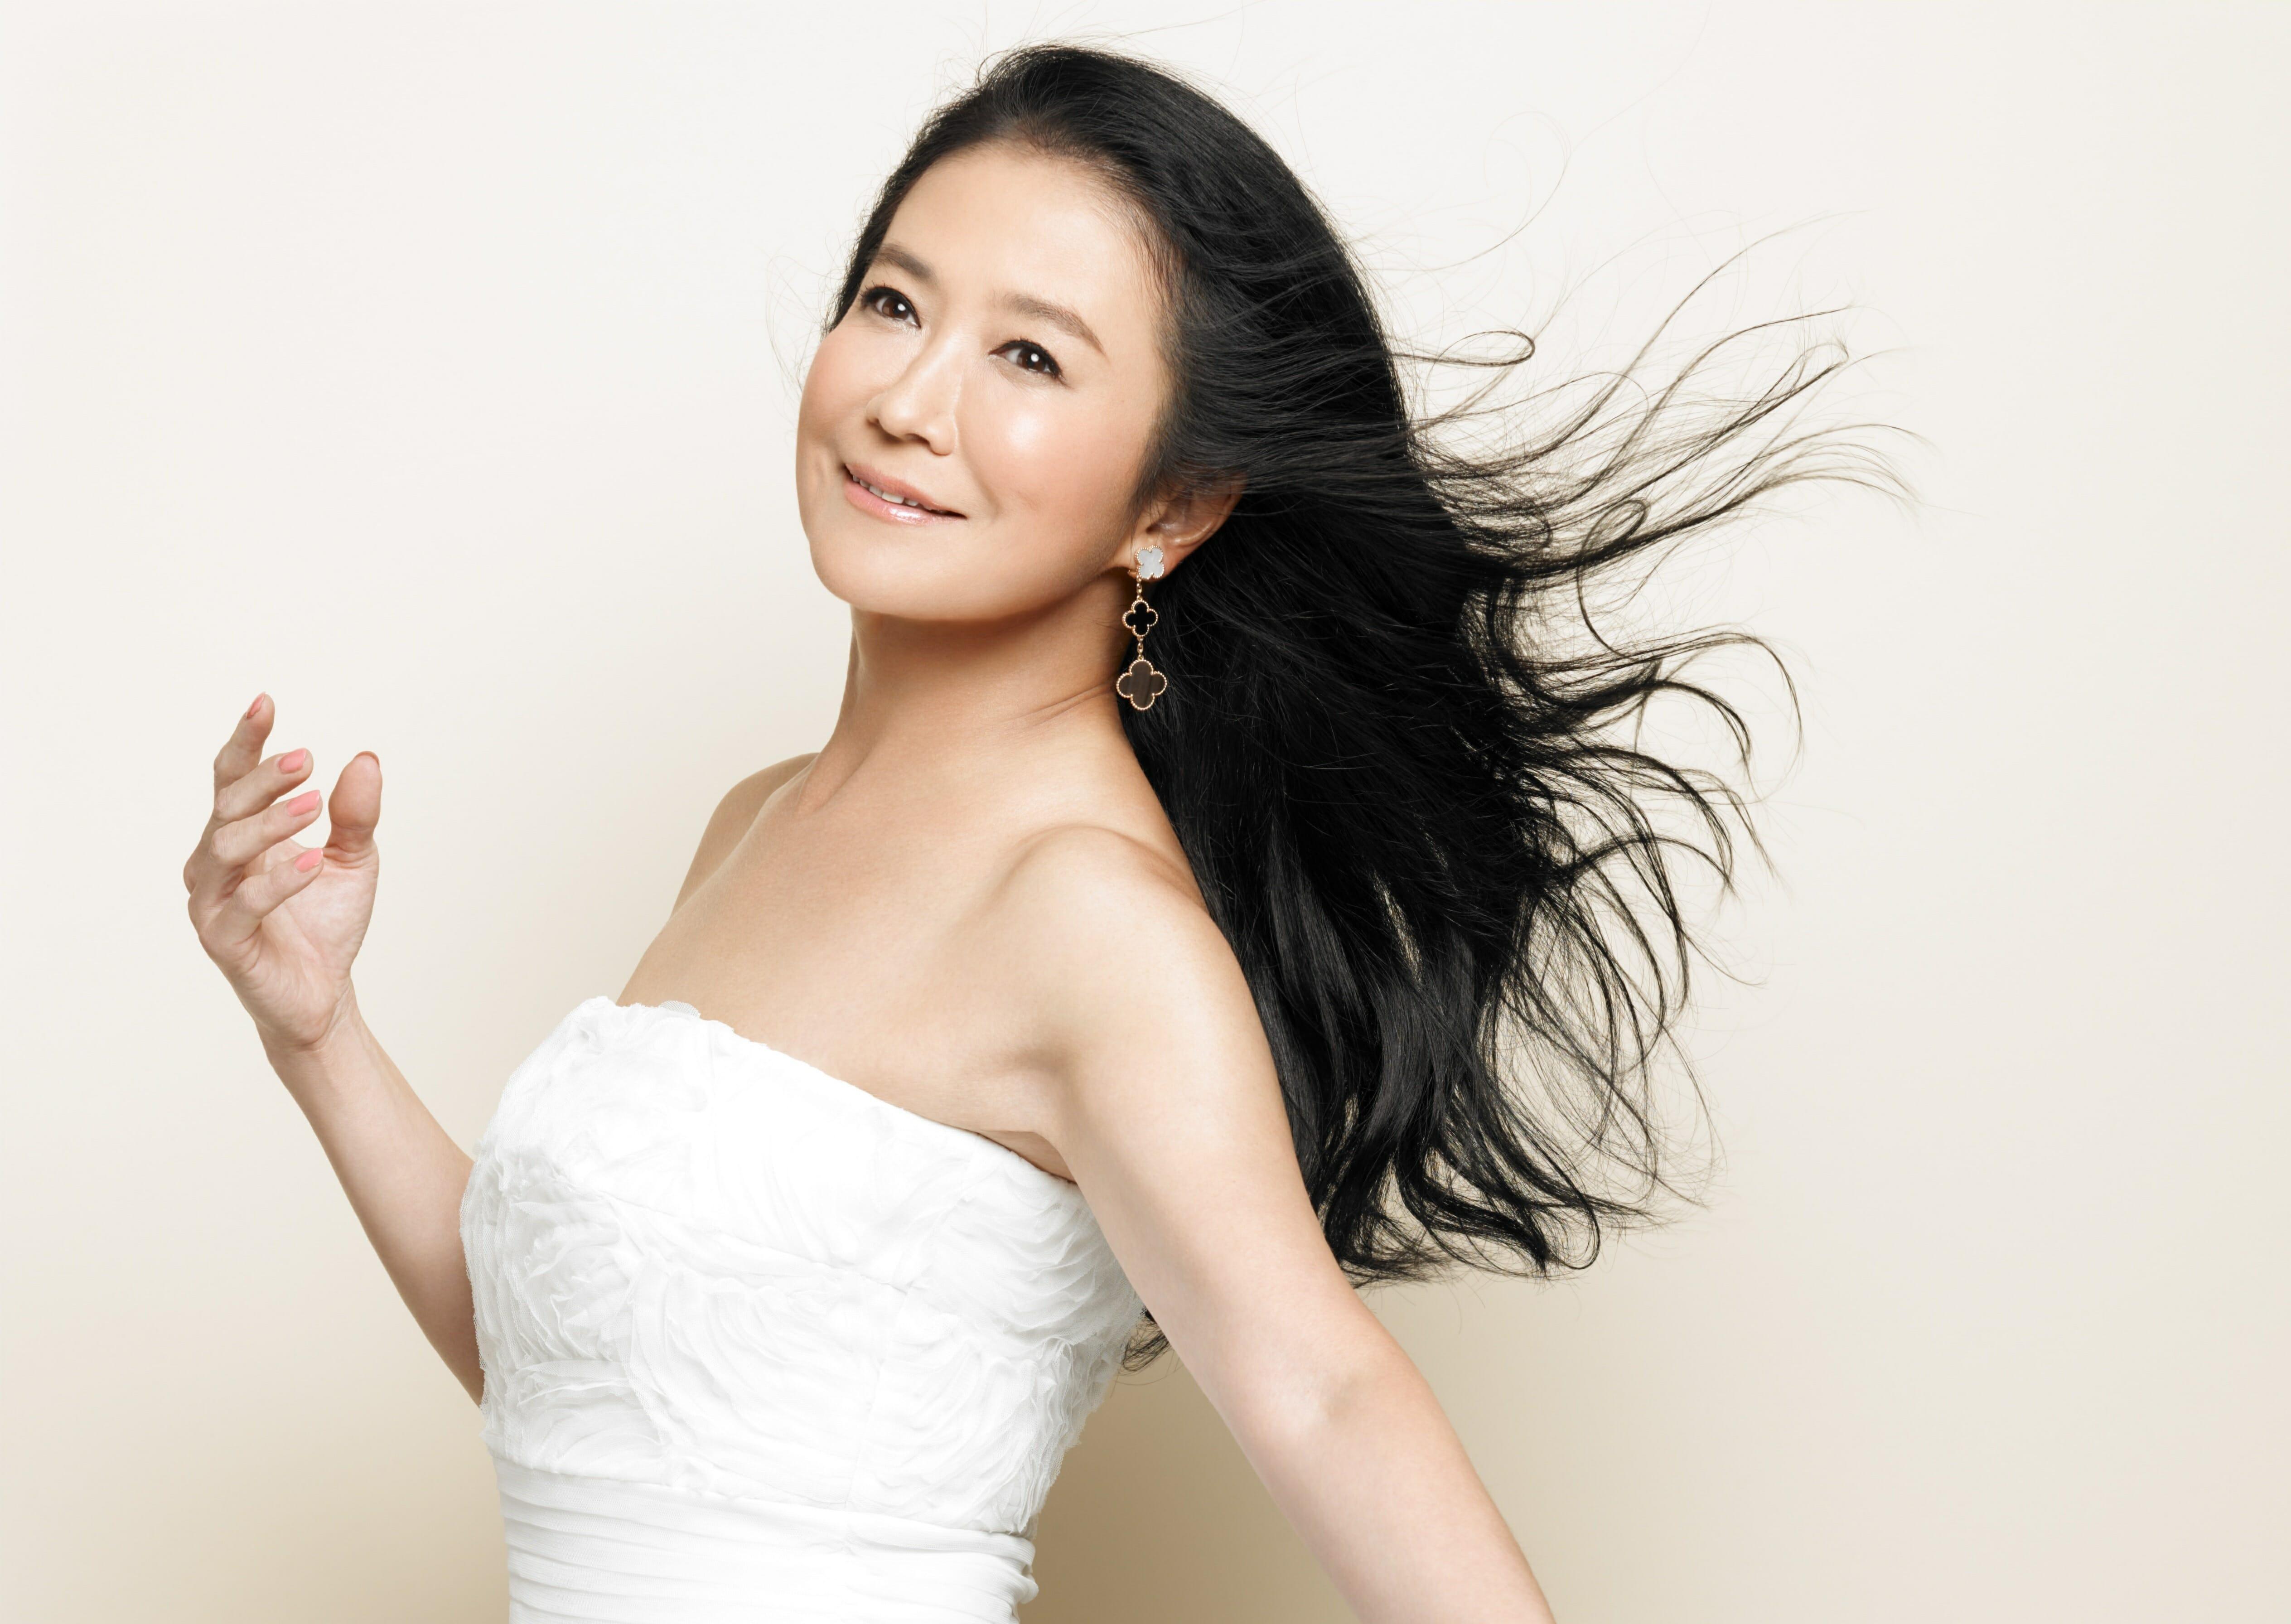 Special Stage<br>世界の歌姫としての地位を築いた<br>日本を代表するディーバ<br>中丸三千繪